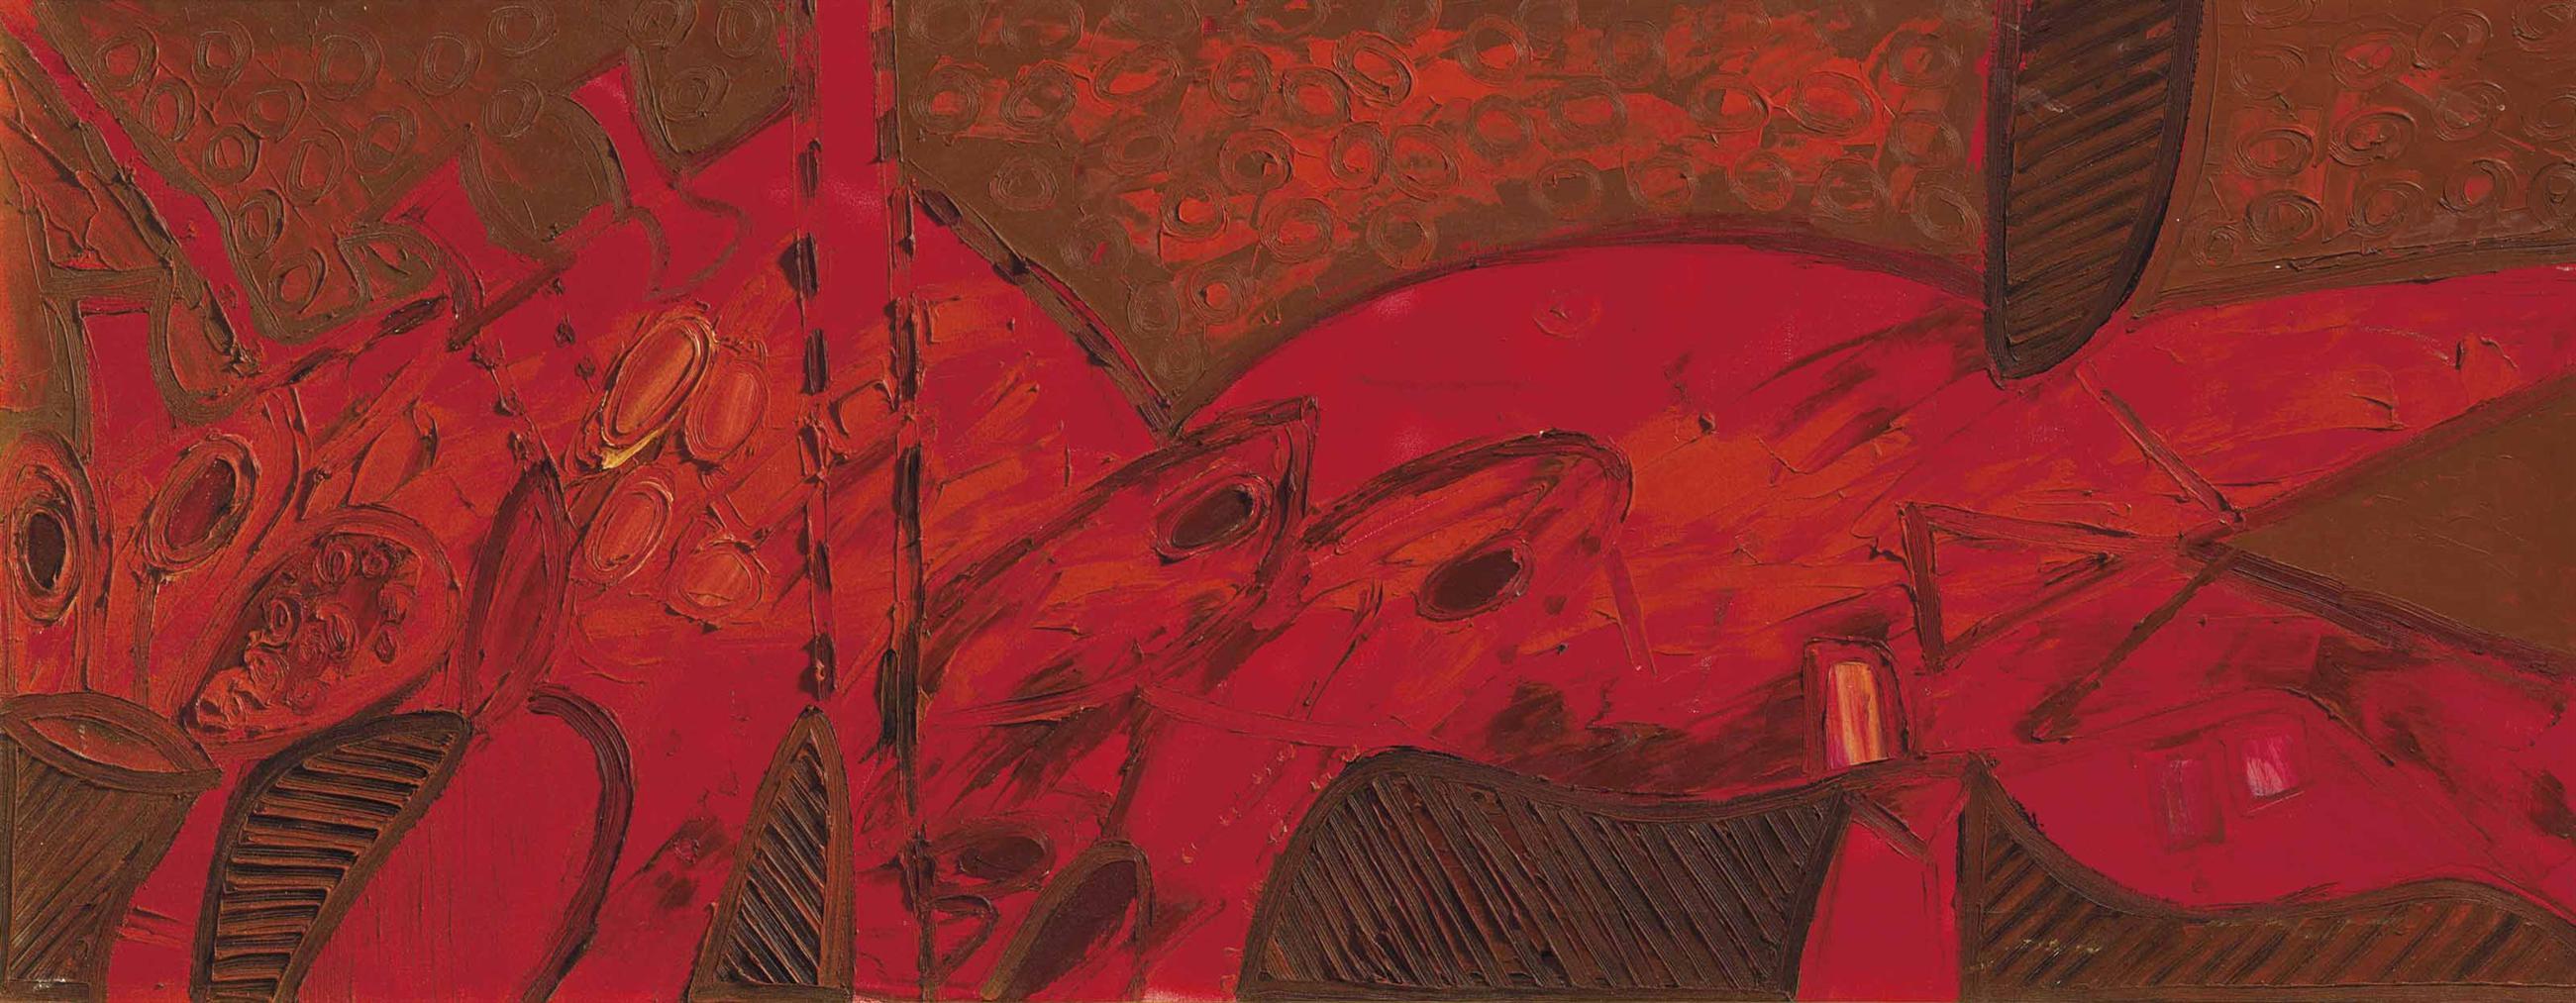 Francis Newton Souza-Red Dream-1966